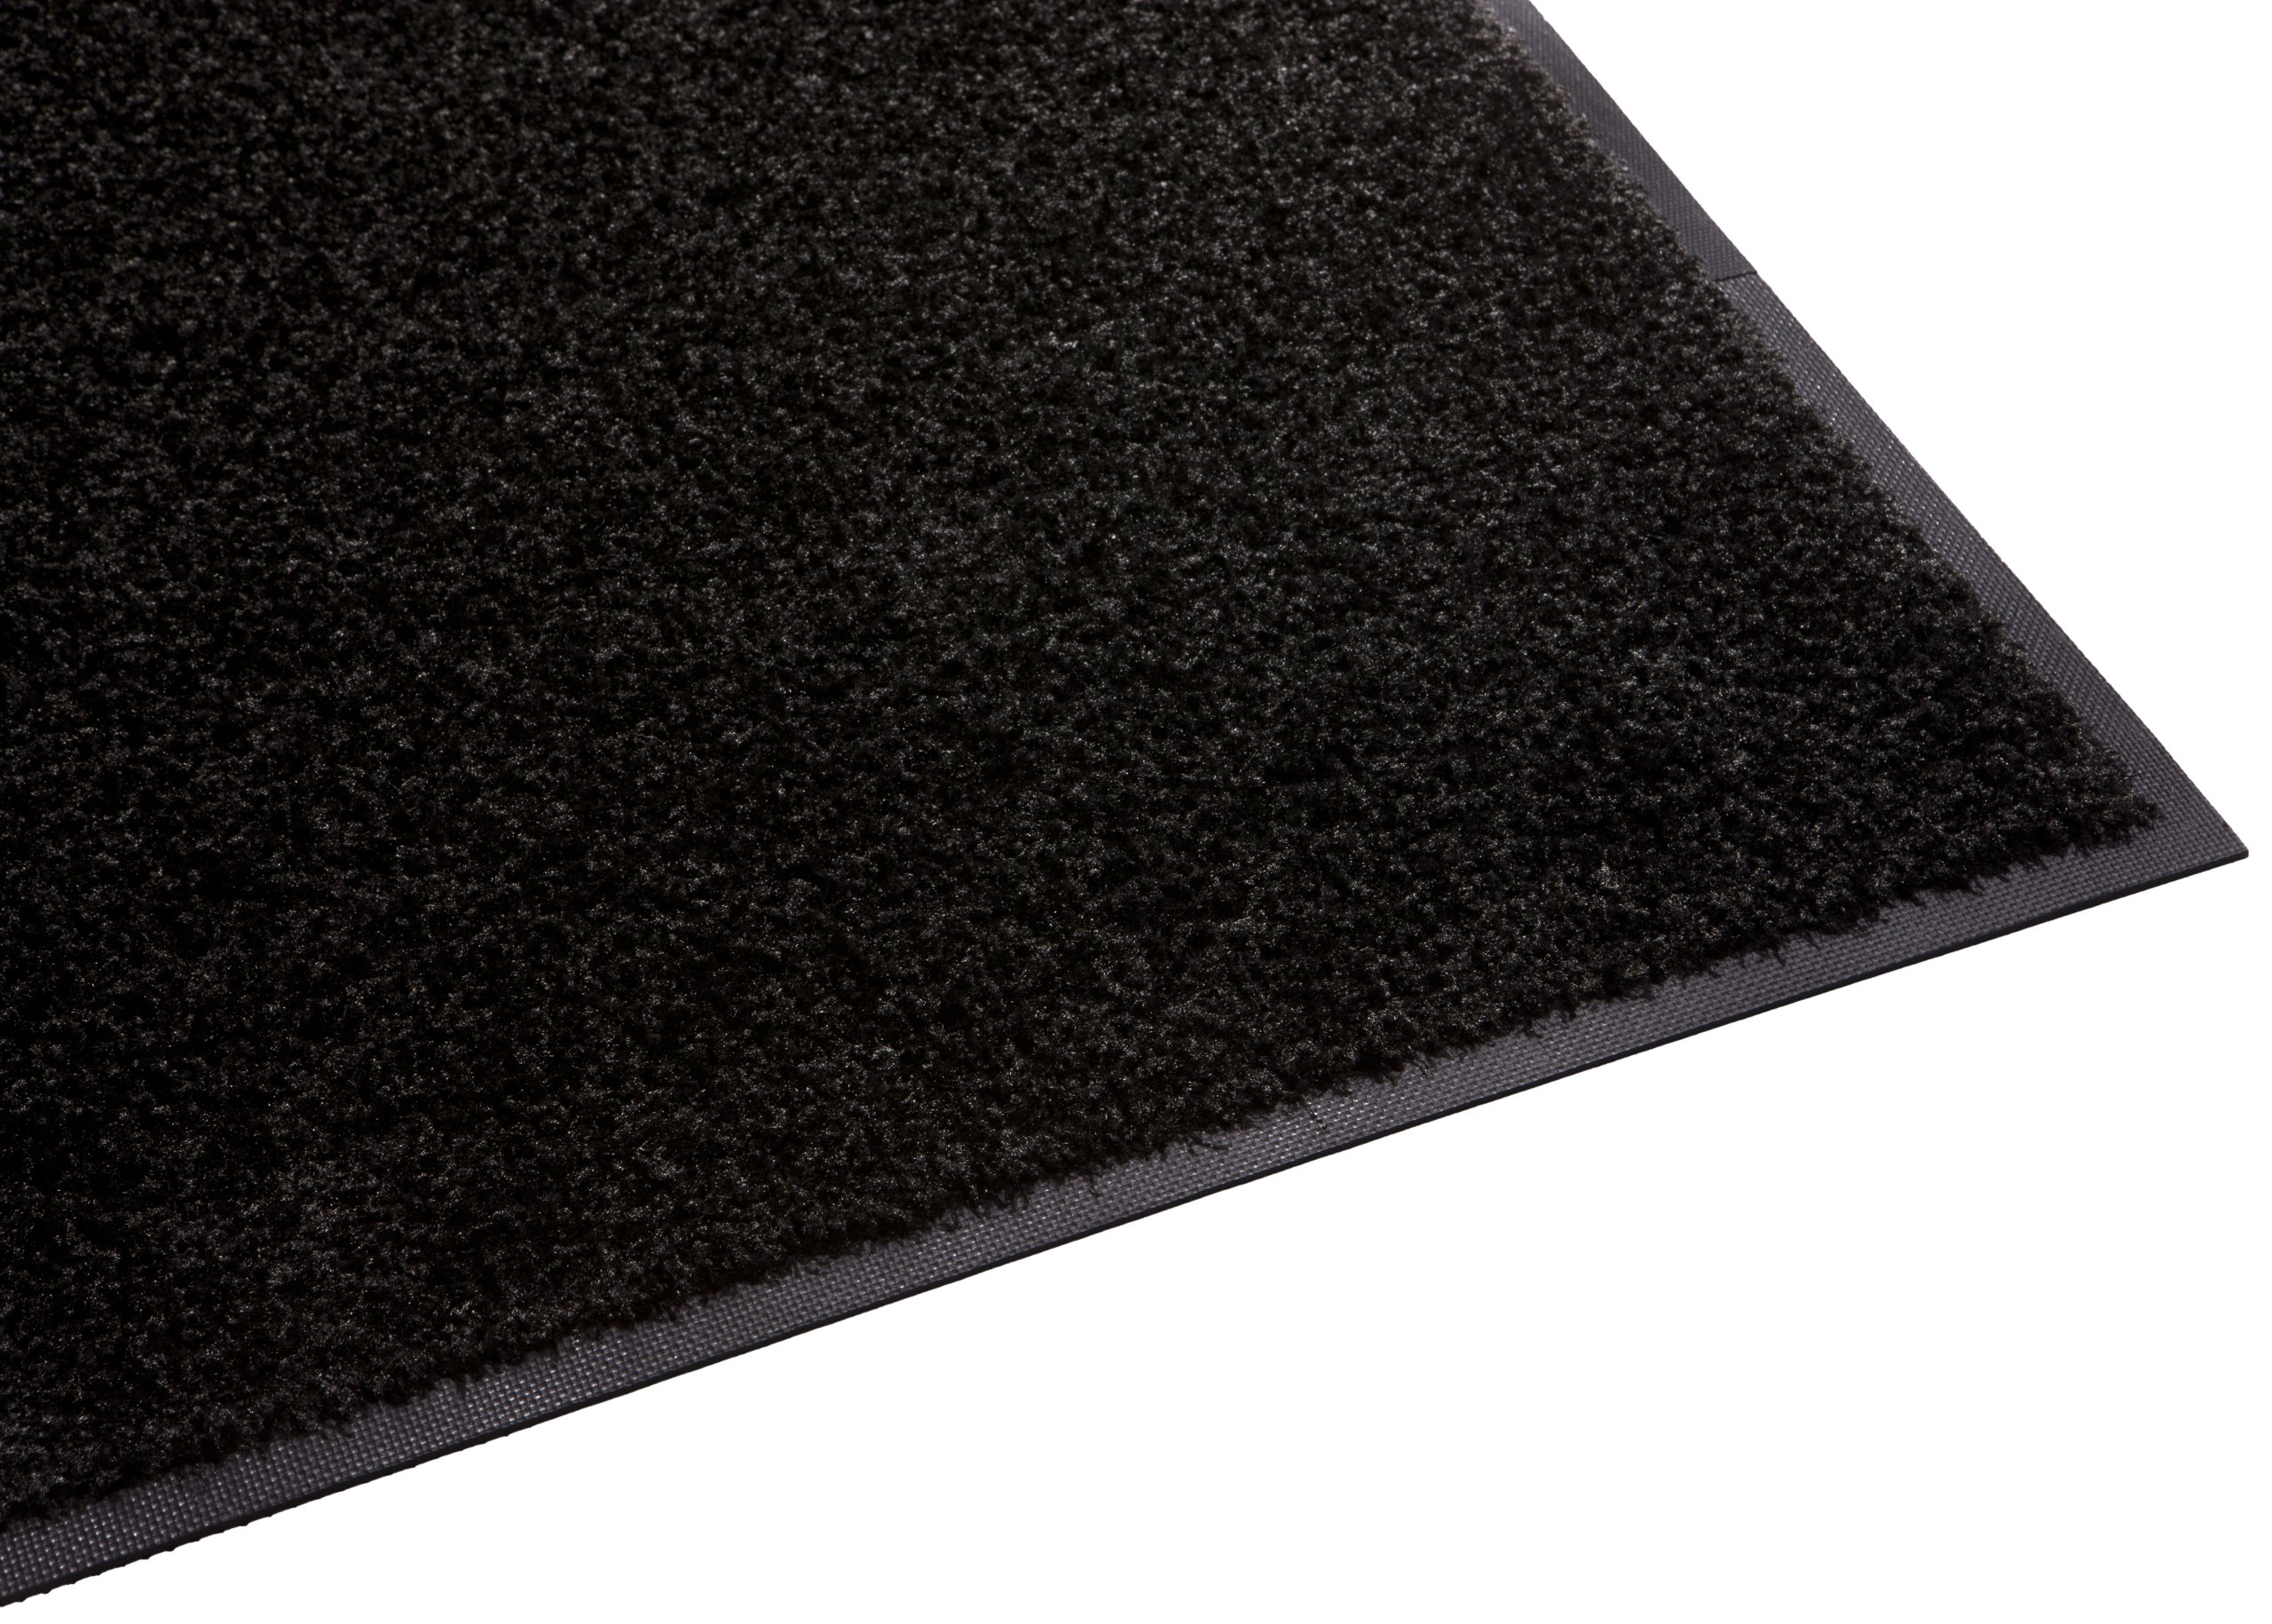 Guardian Platinum Series Indoor Wiper Floor Mat, Rubber with Nylon Carpet, 4'x10', Black by Guardian